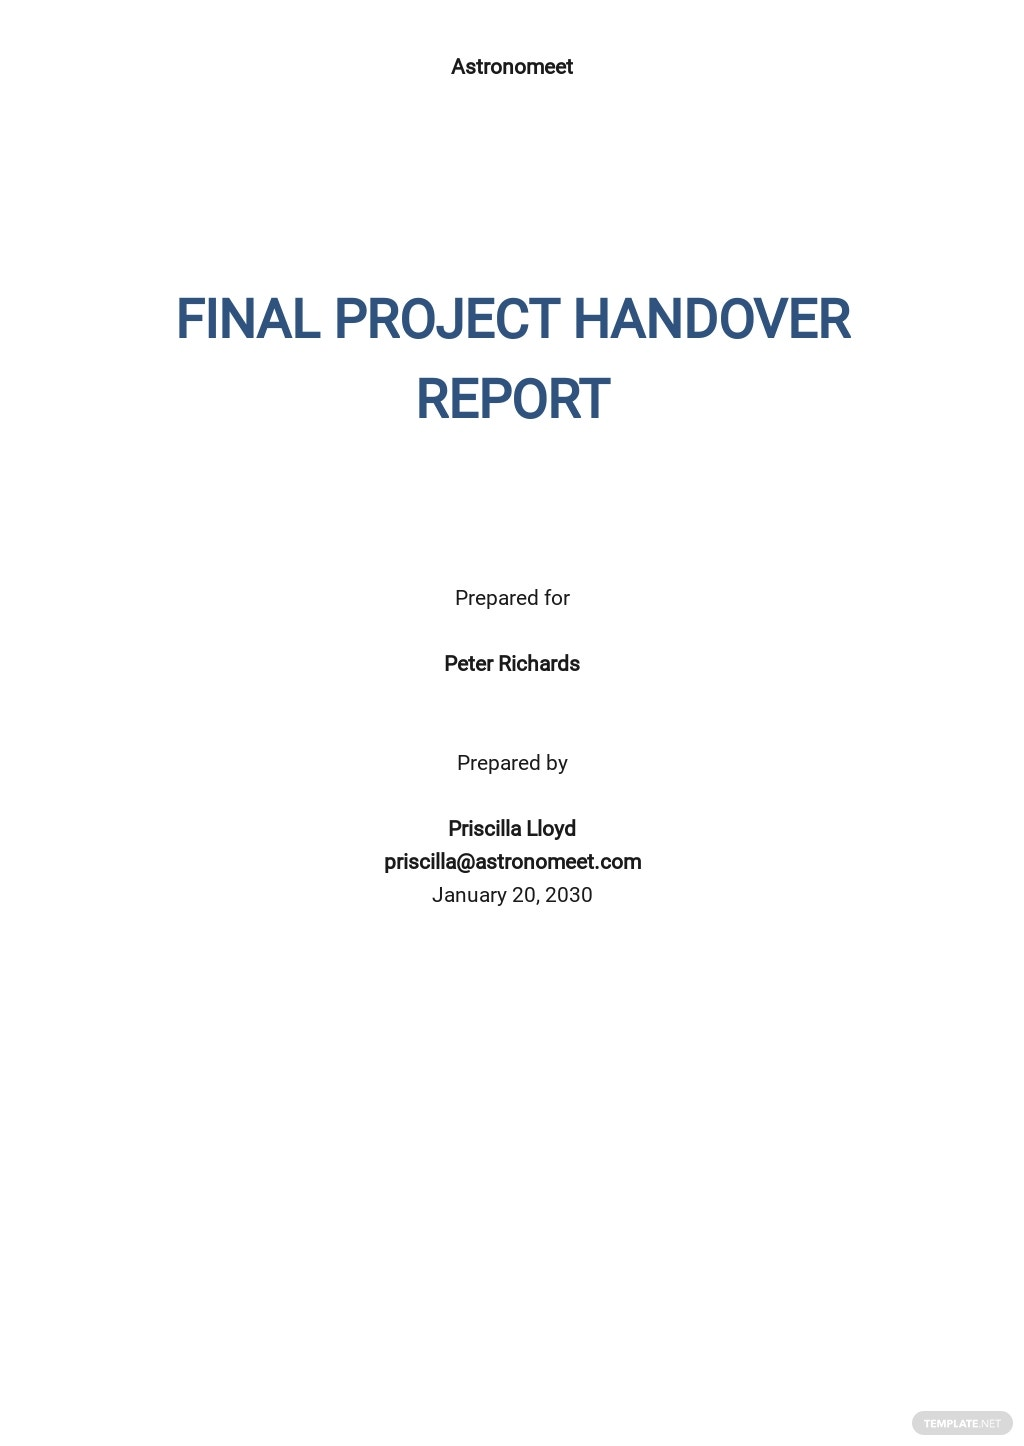 Final Project Handover Report